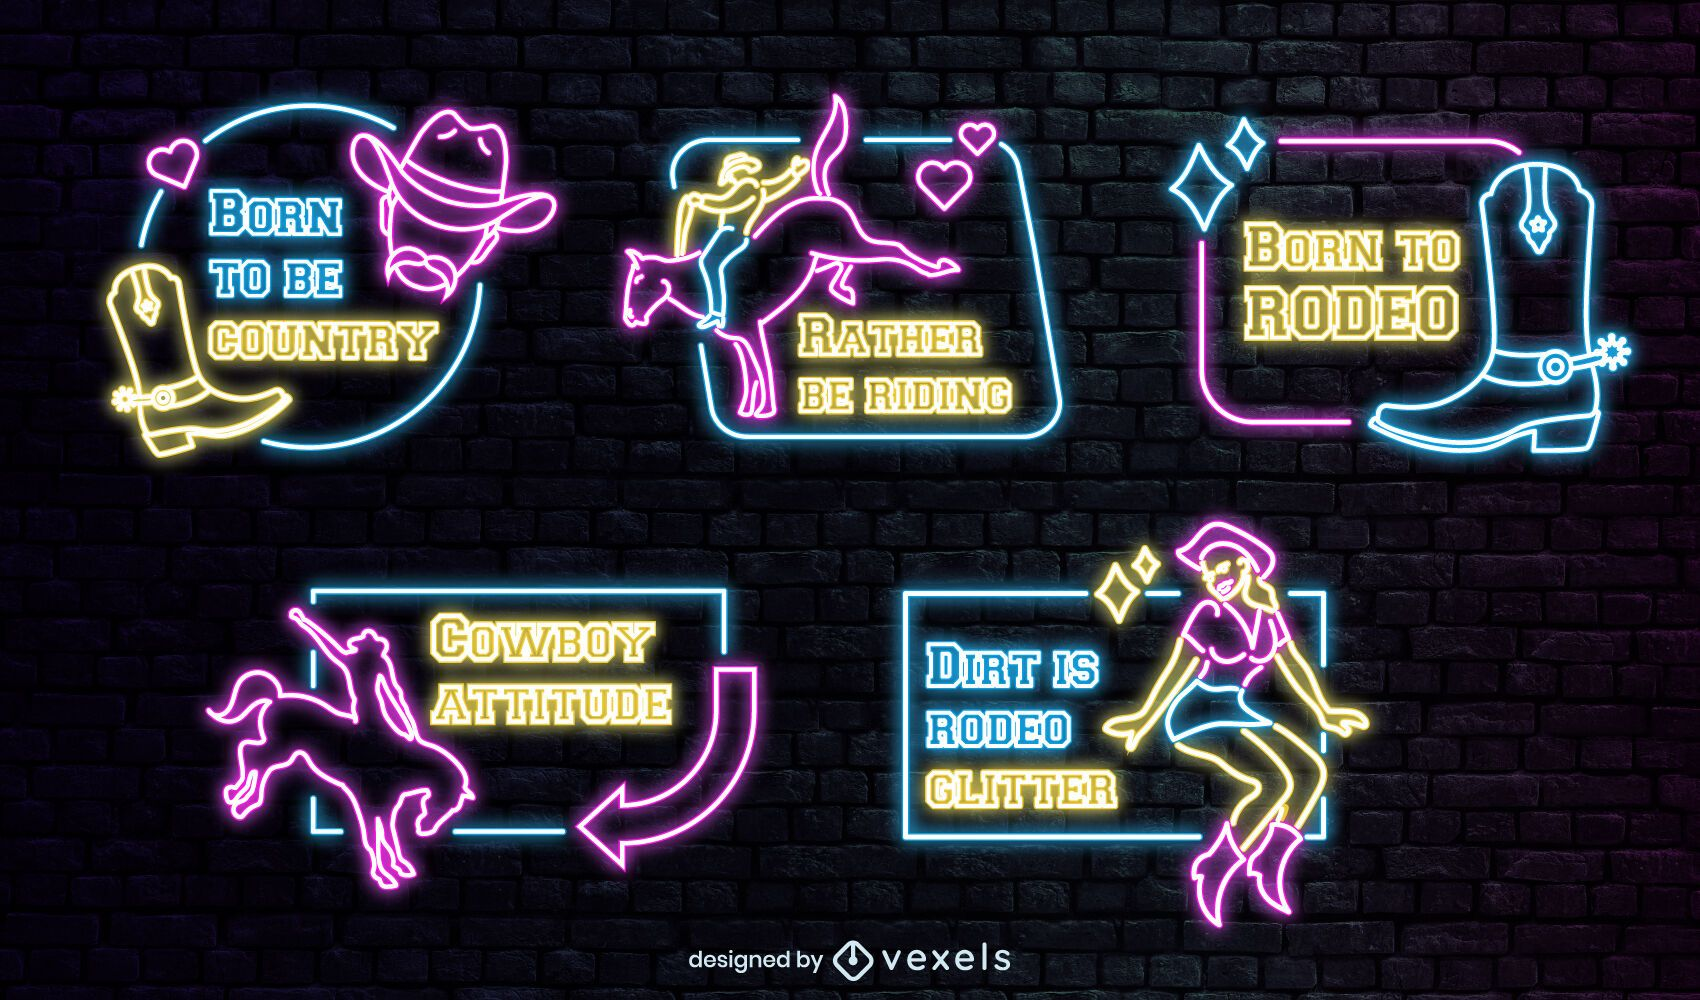 Cowboy-Ranch-Set Neon-Abzeichen